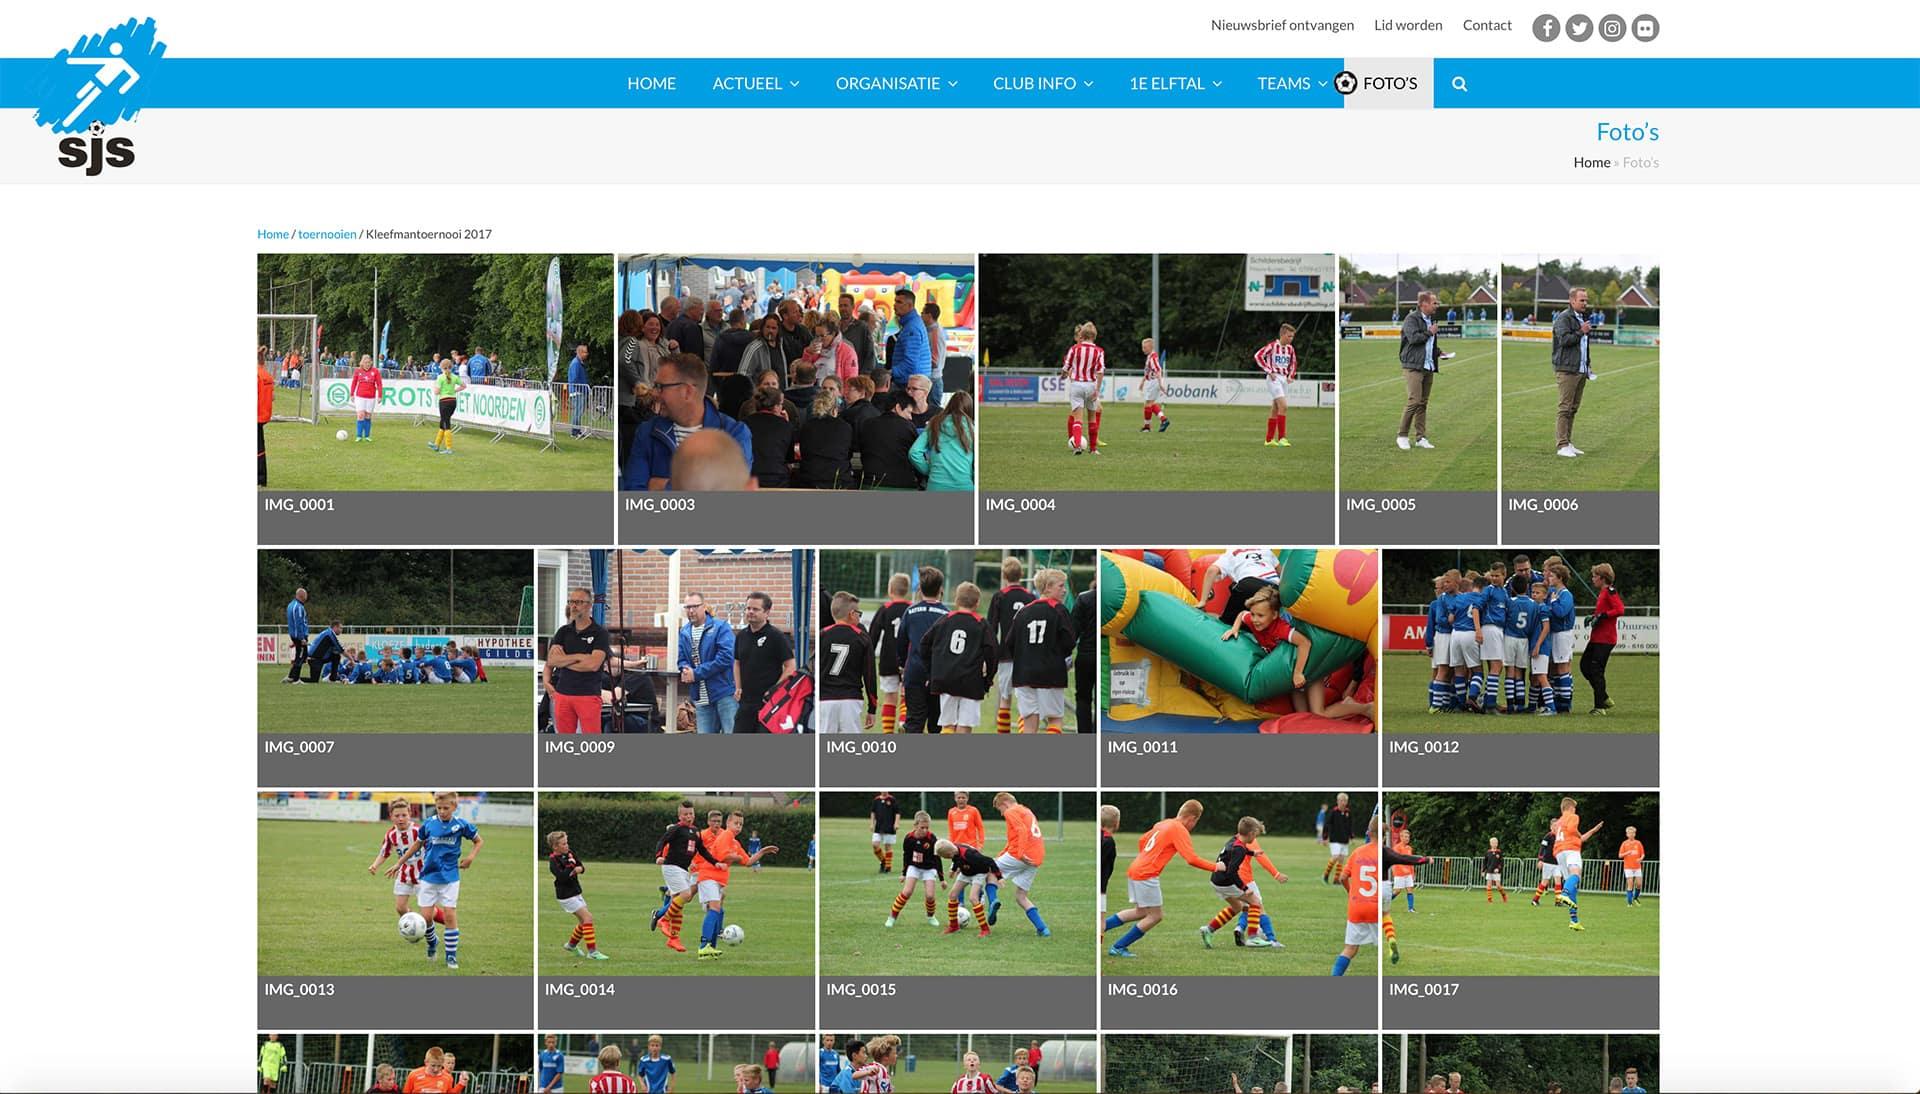 Voetbal Vereniging Sjs7